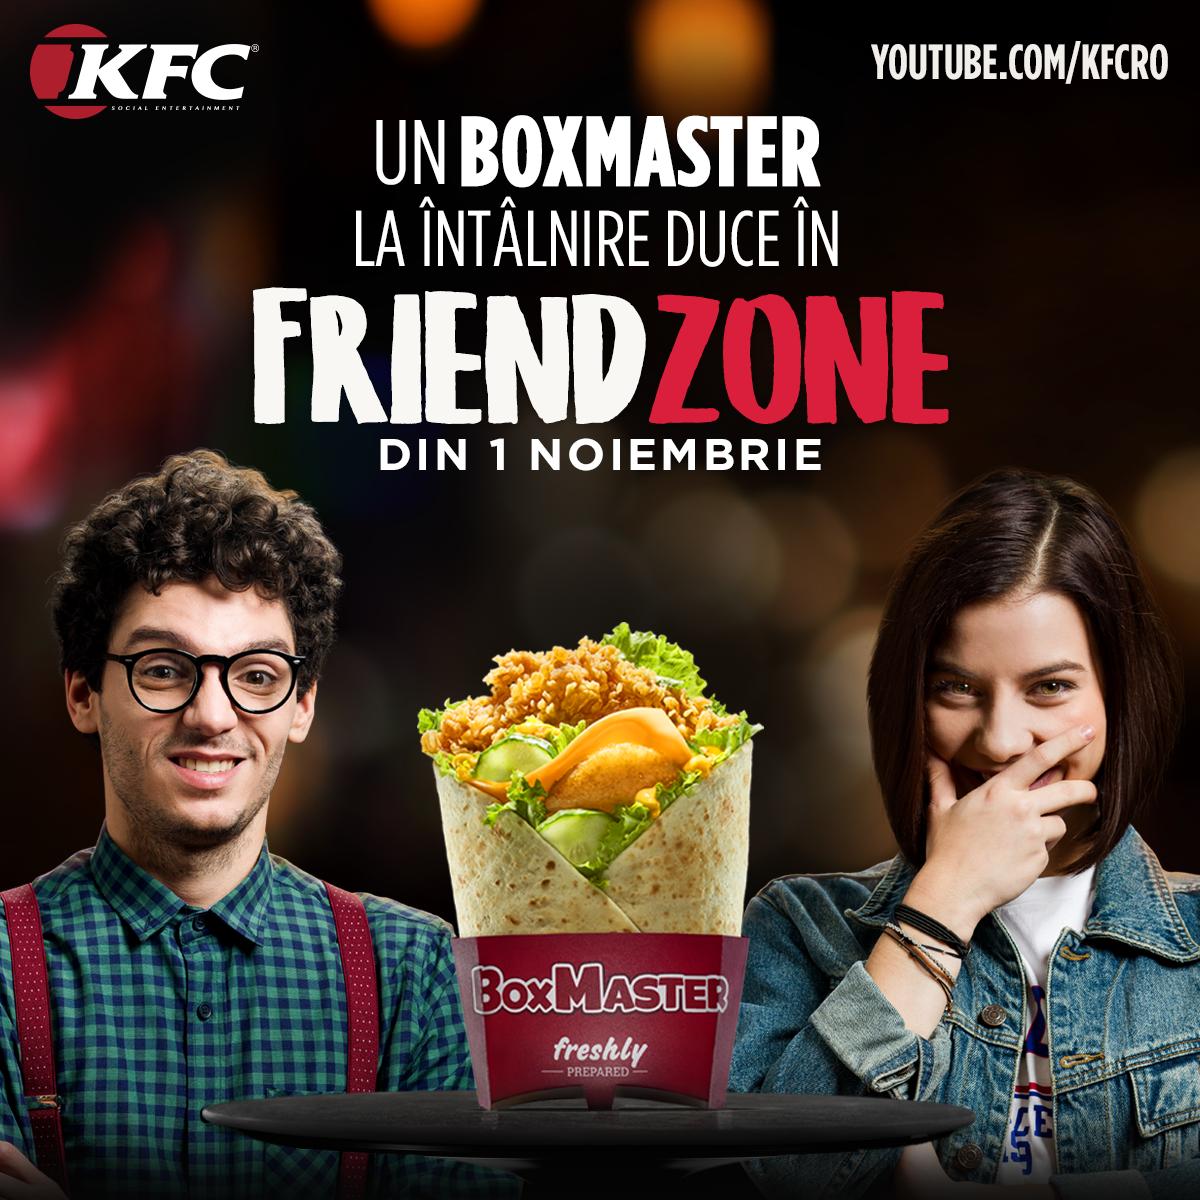 Ctig Un Voucher La Kfc Dac Ne Spui O Ntmplare Funny Din Friendzone